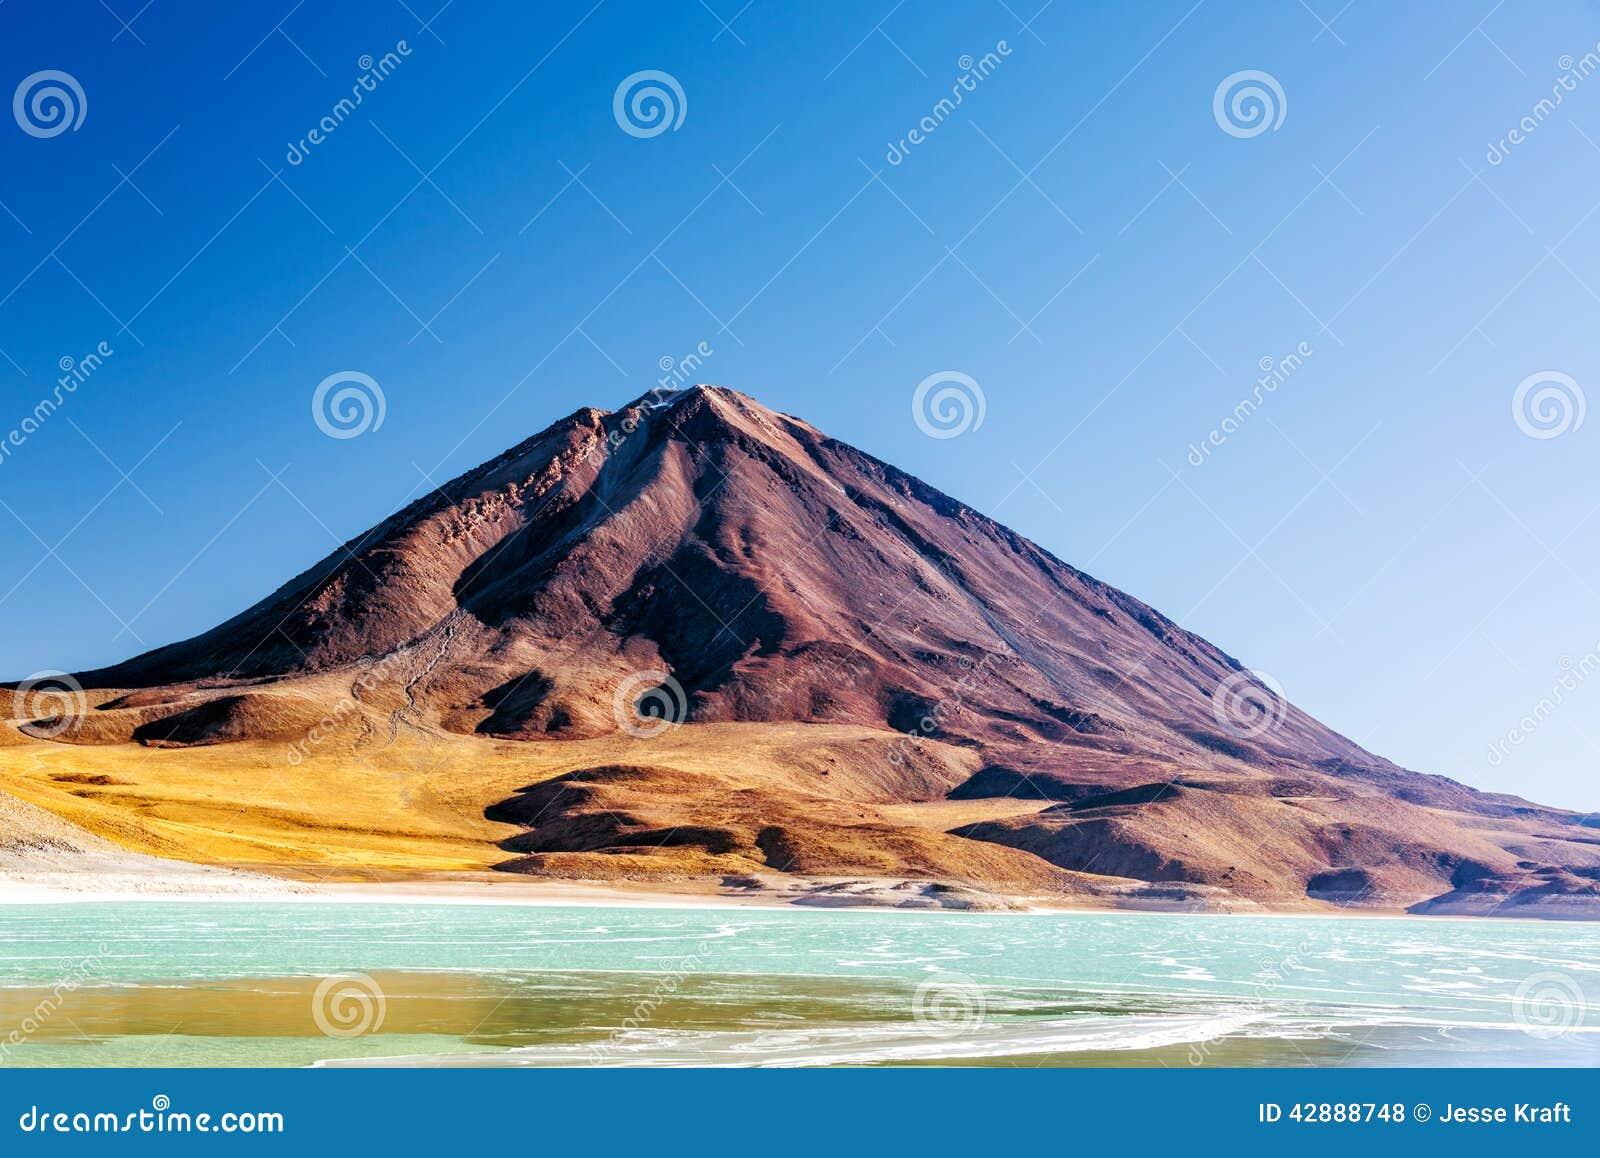 Взгляд вулкана Licancabur